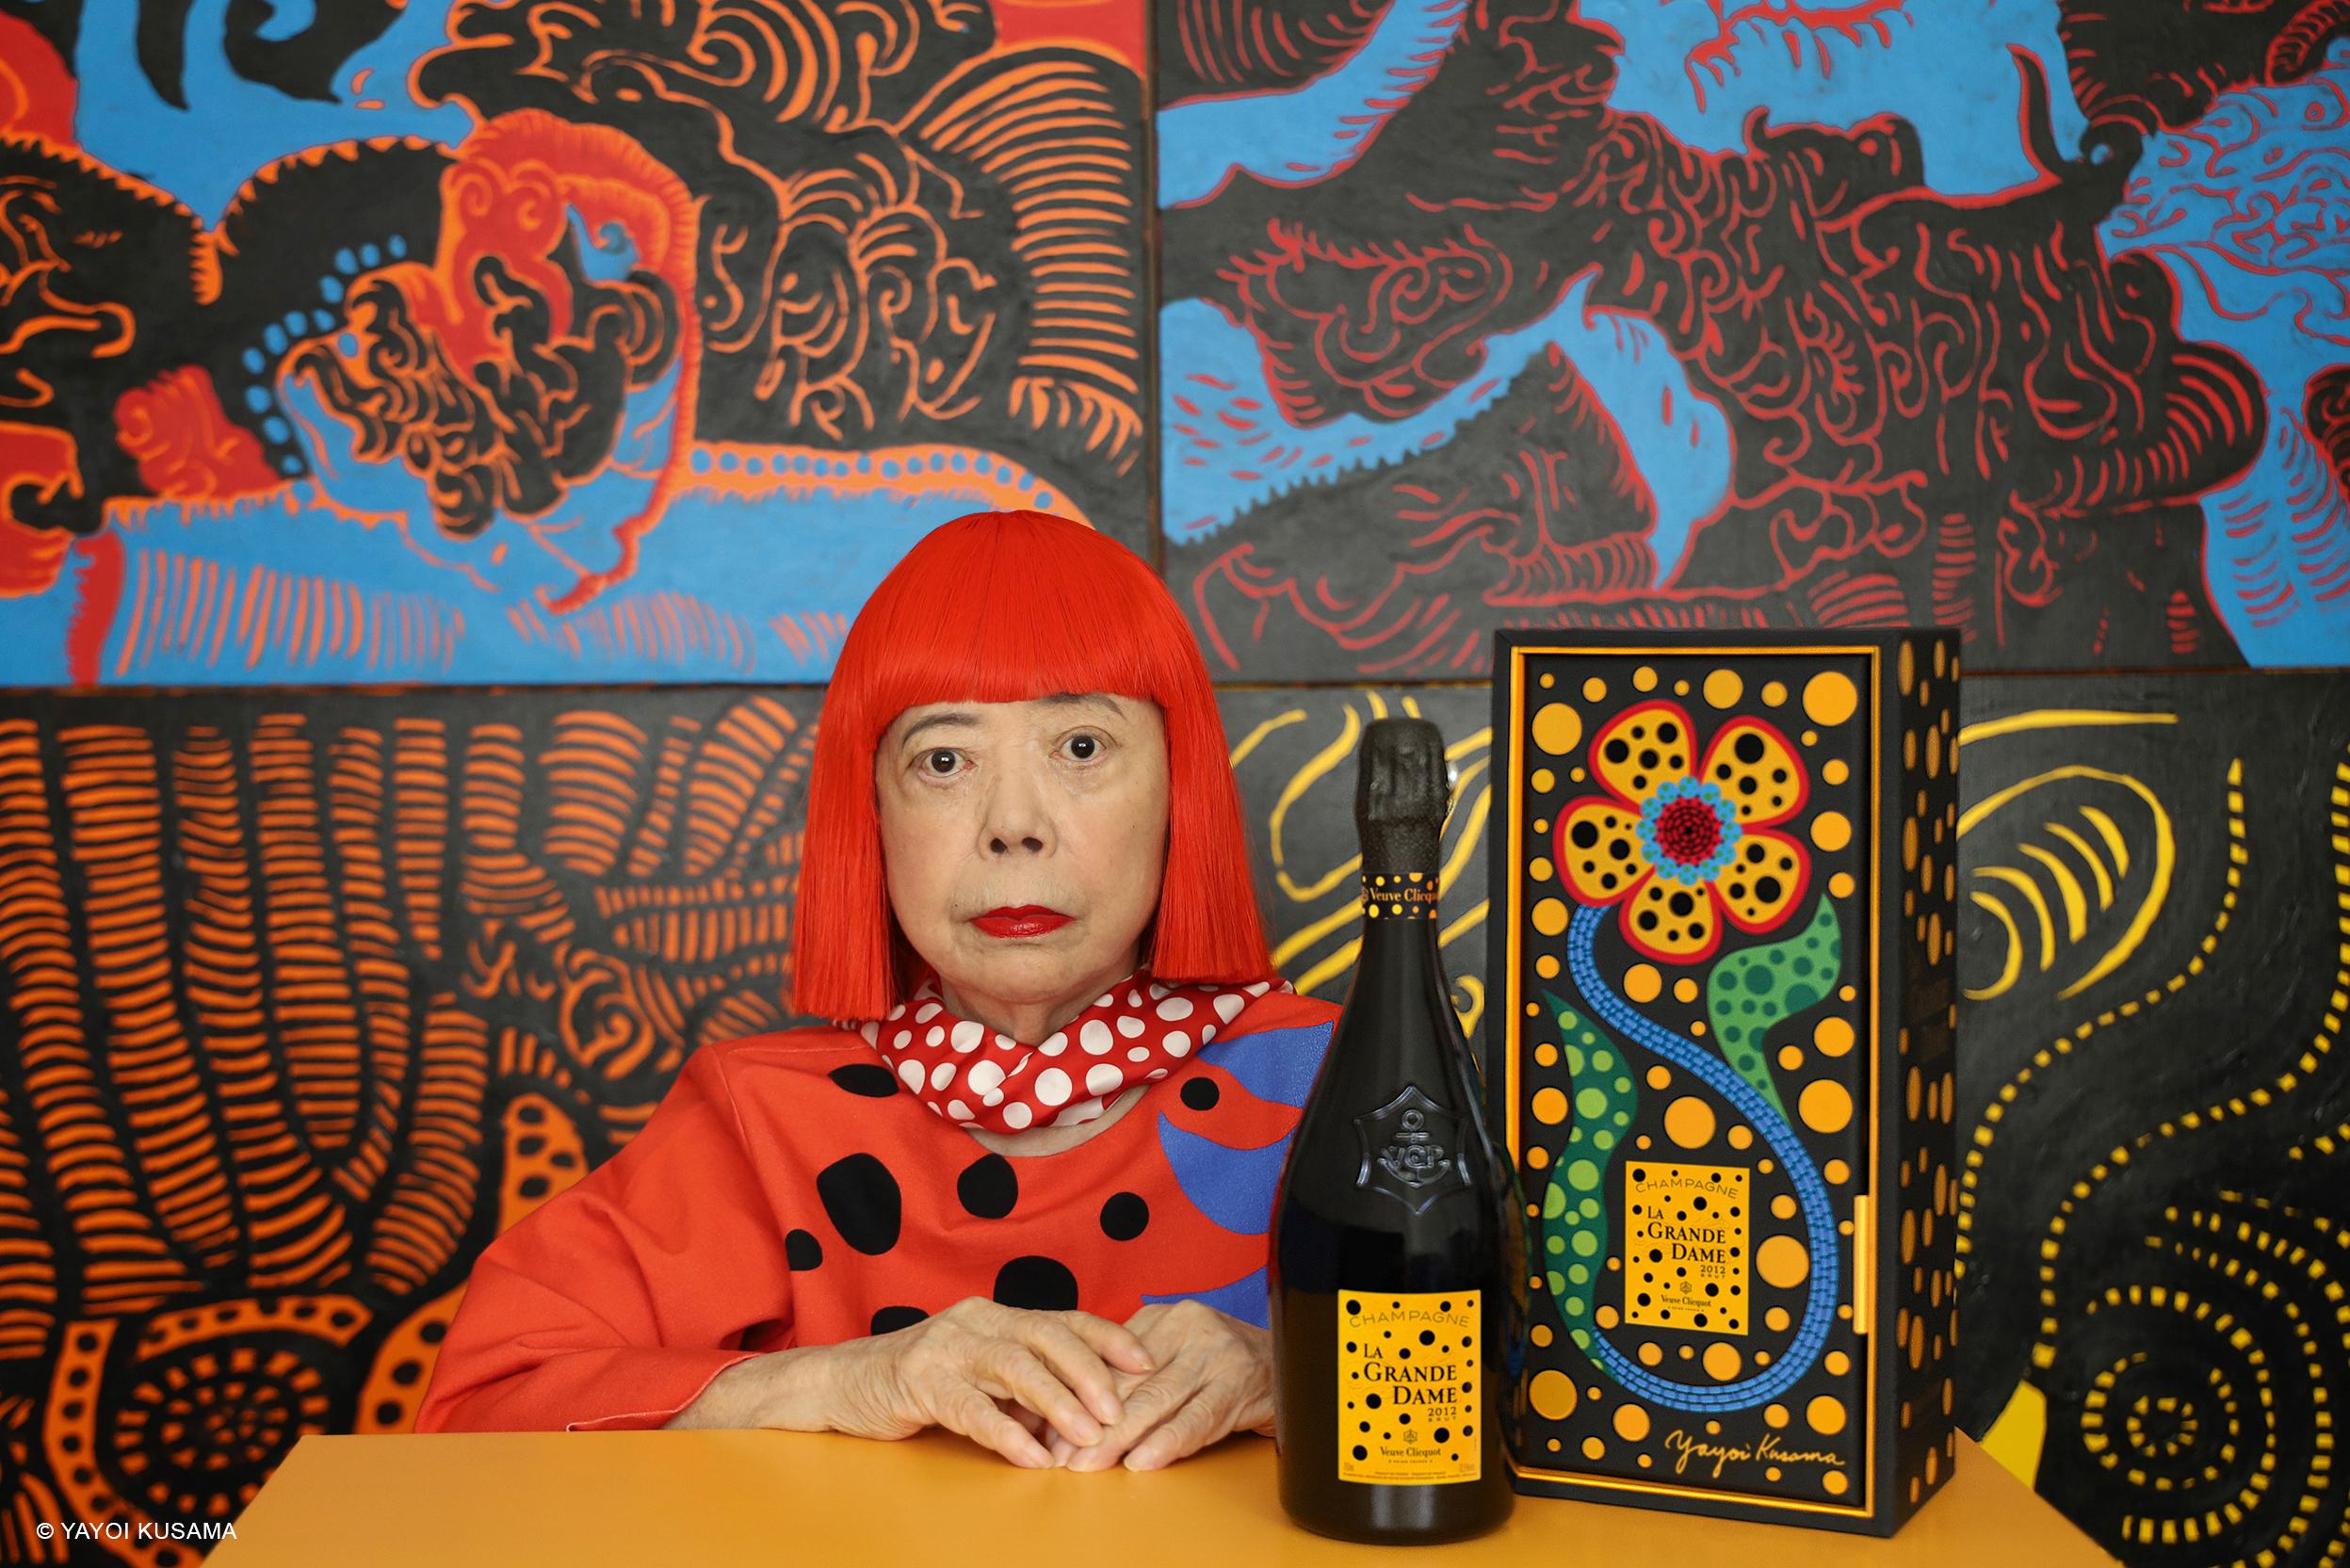 veuve-clicquot-yayoi-kusama-la-grande-madame-2012